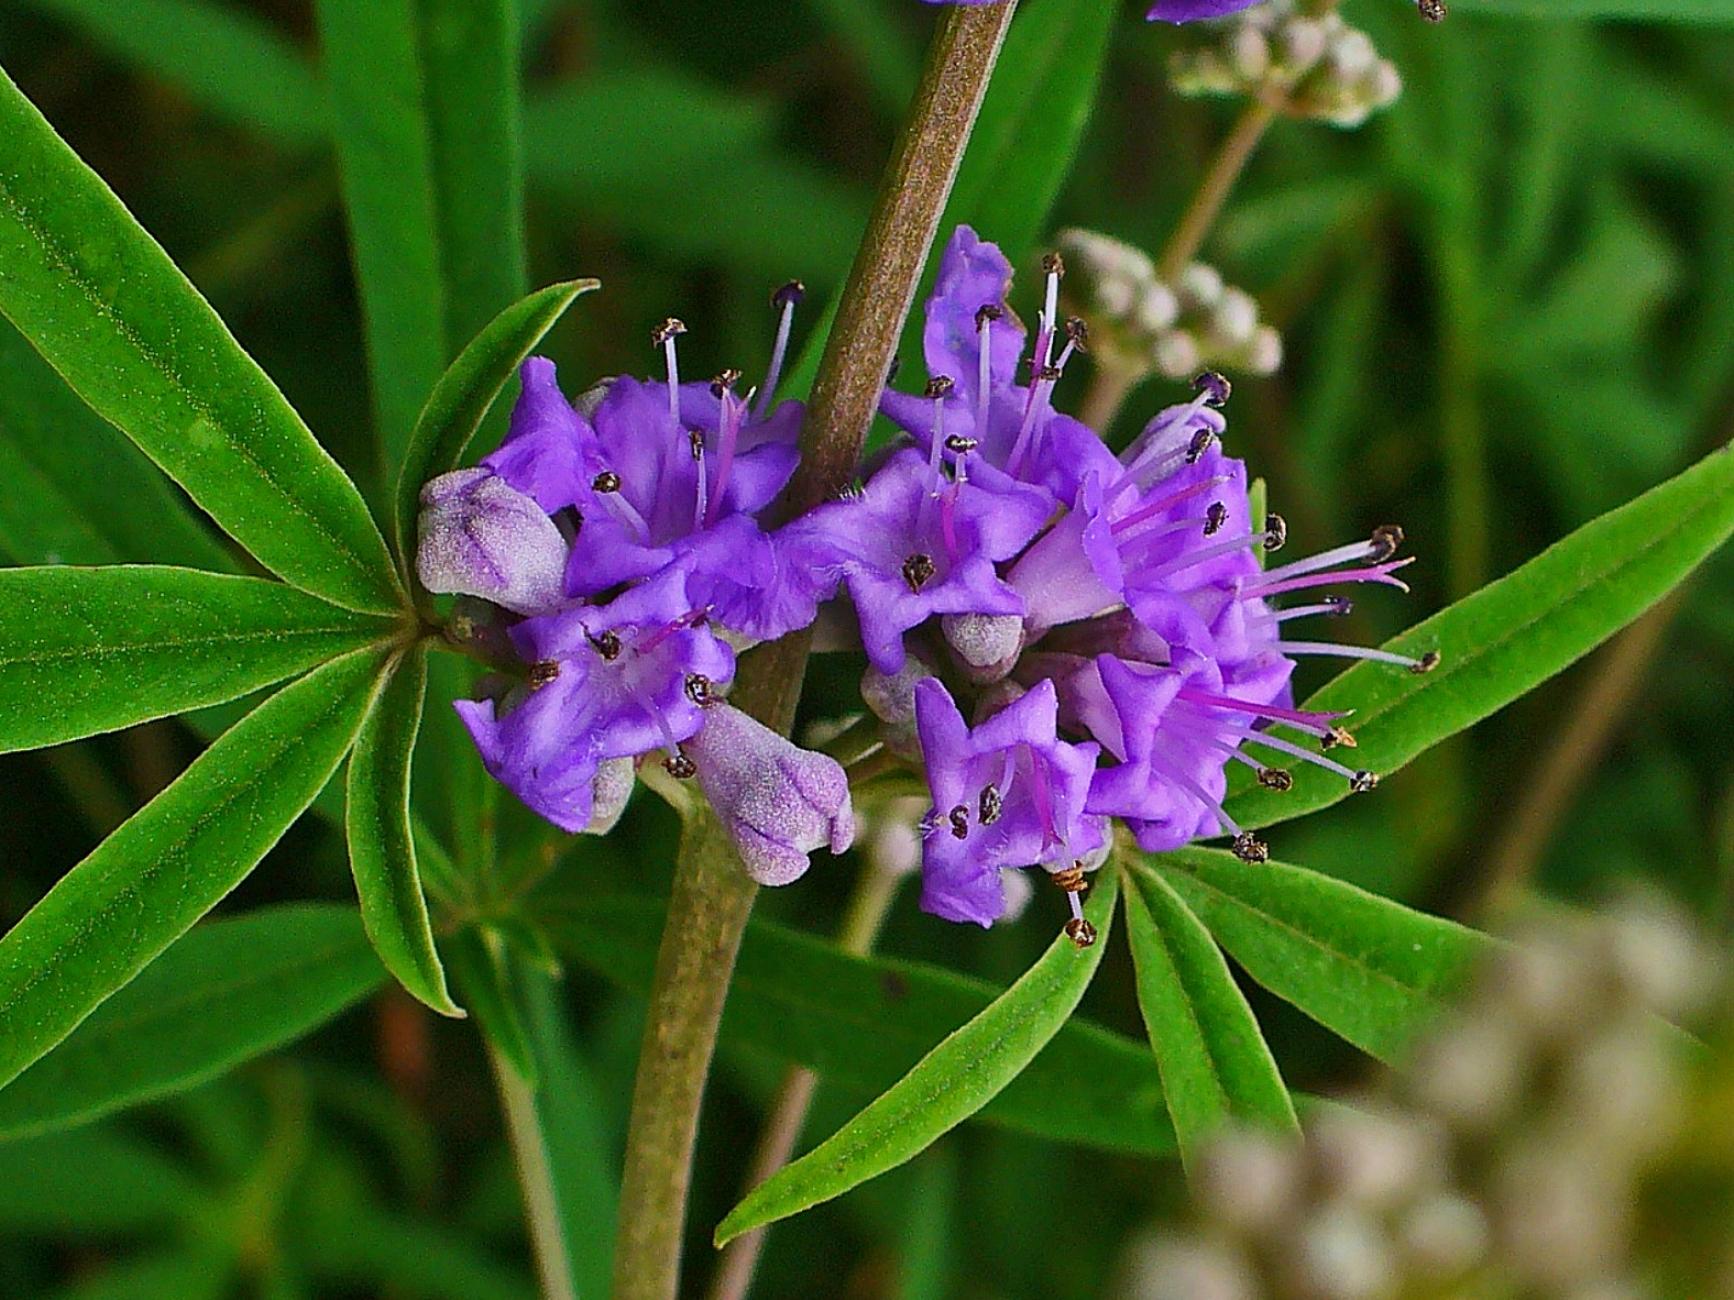 Chaste Tree purple flowers close up